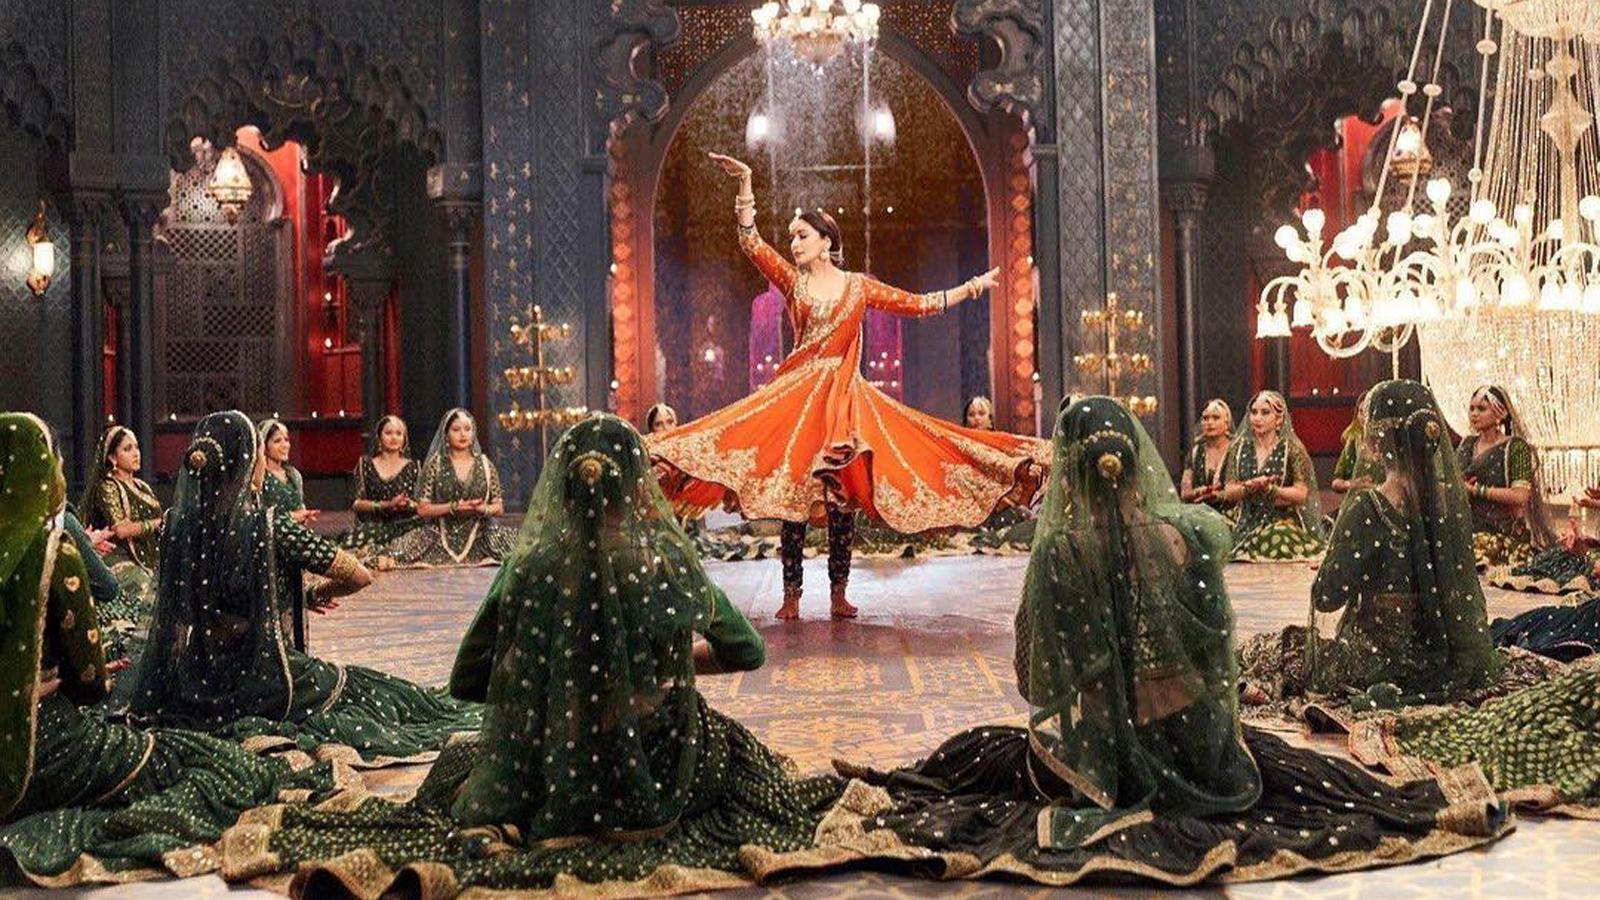 Alia Bhatt shares teaser of 'Kalank' song 'Tabaah Ho Gaye' featuring Madhuri Dixit